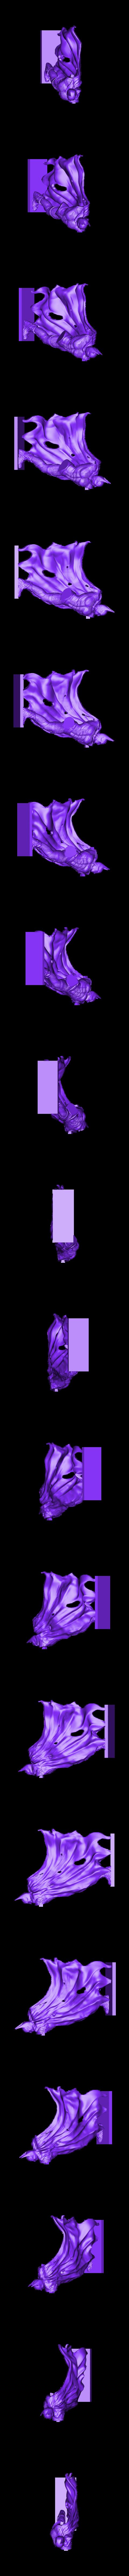 Body.stl Download OBJ file BATMAN Battle Pose • 3D print template, tolgaaxu